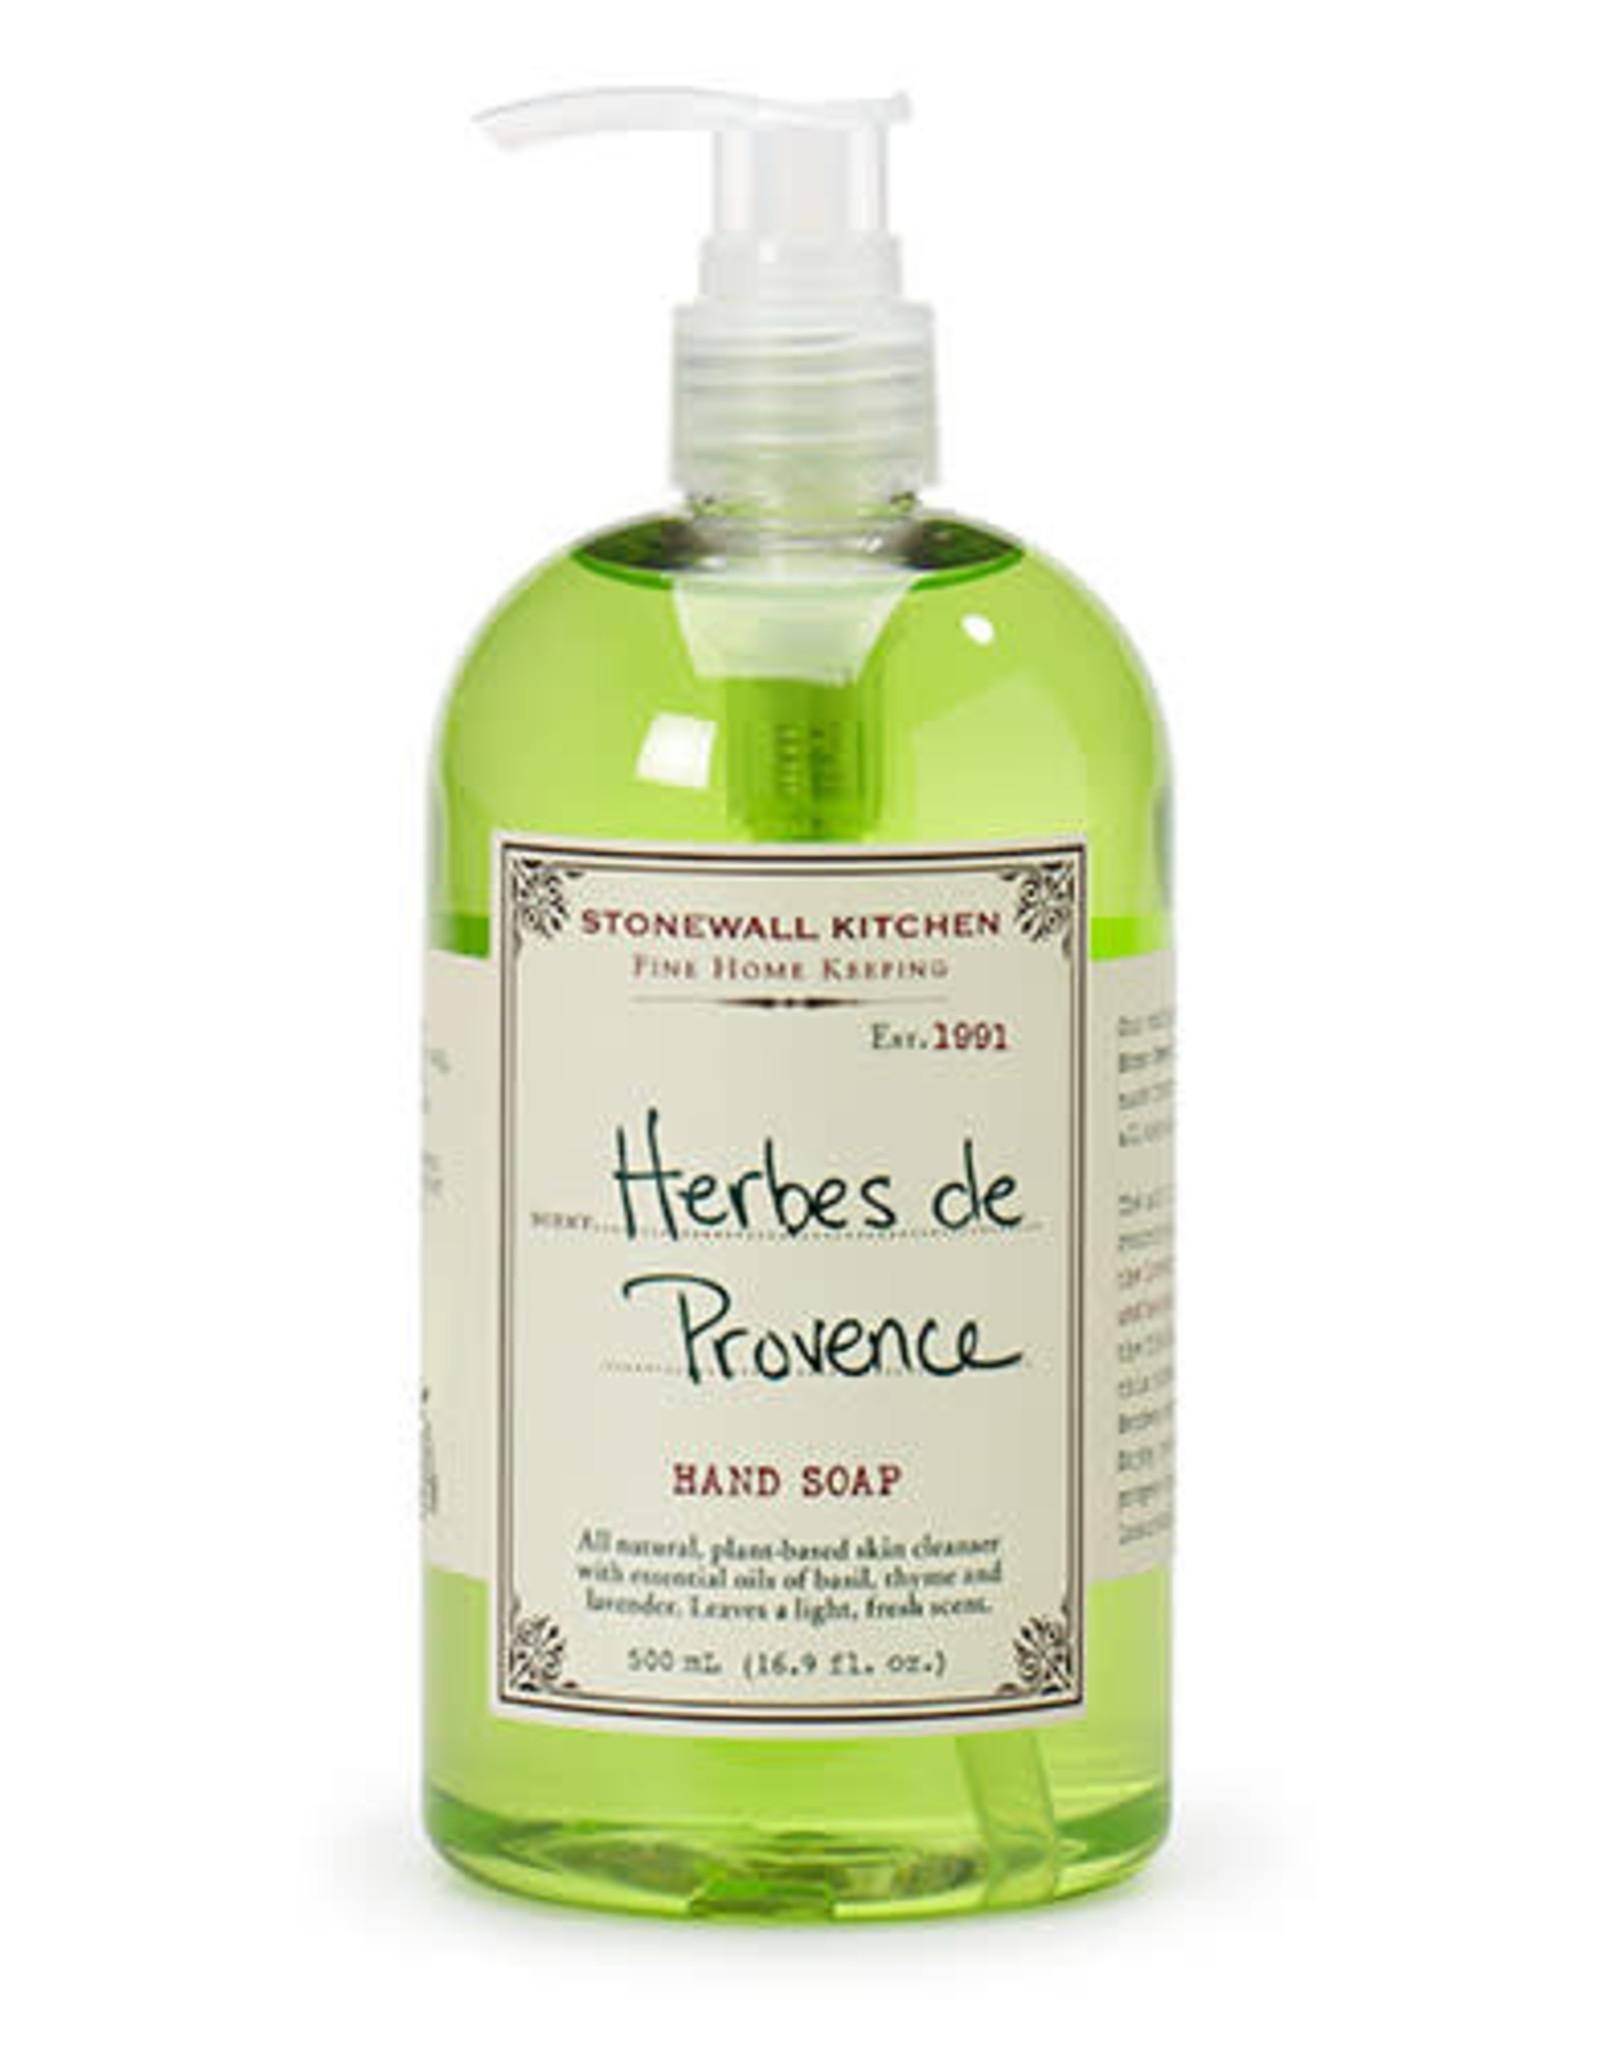 Stonewall Kitchen Herbes de Provence Hand Soap